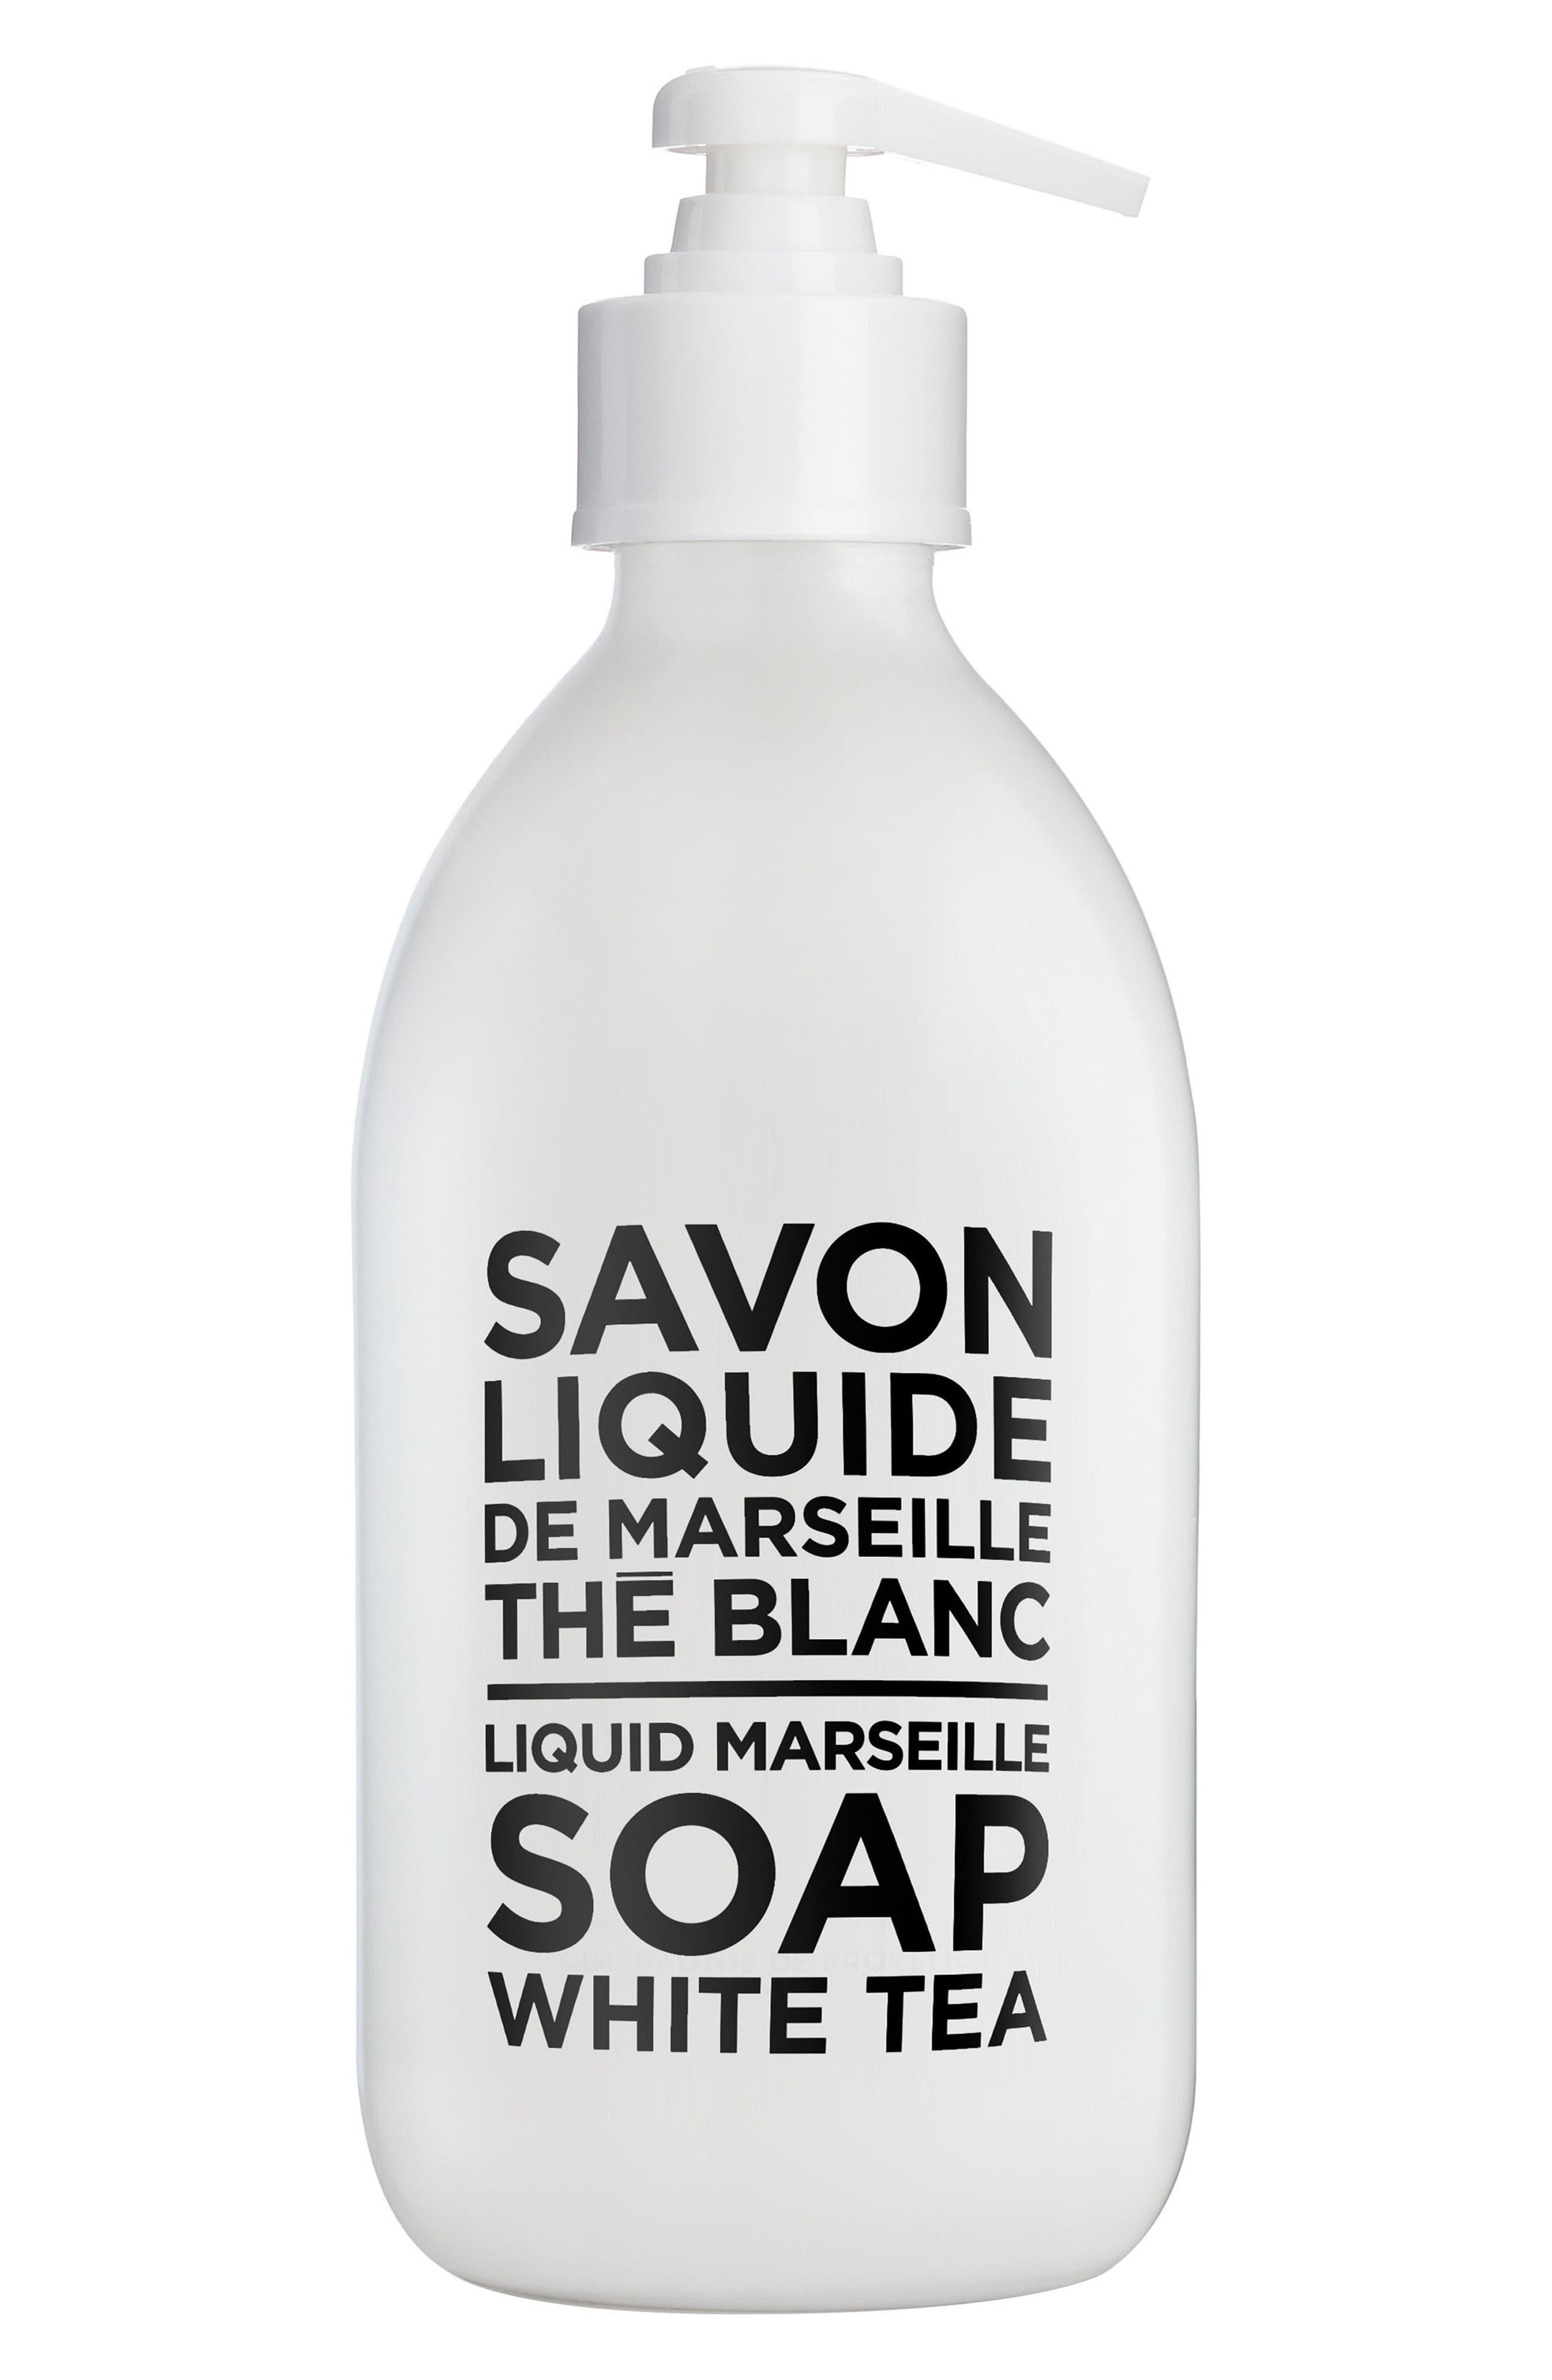 White Tea Liquid Marseille Soap,                             Main thumbnail 1, color,                             No Color